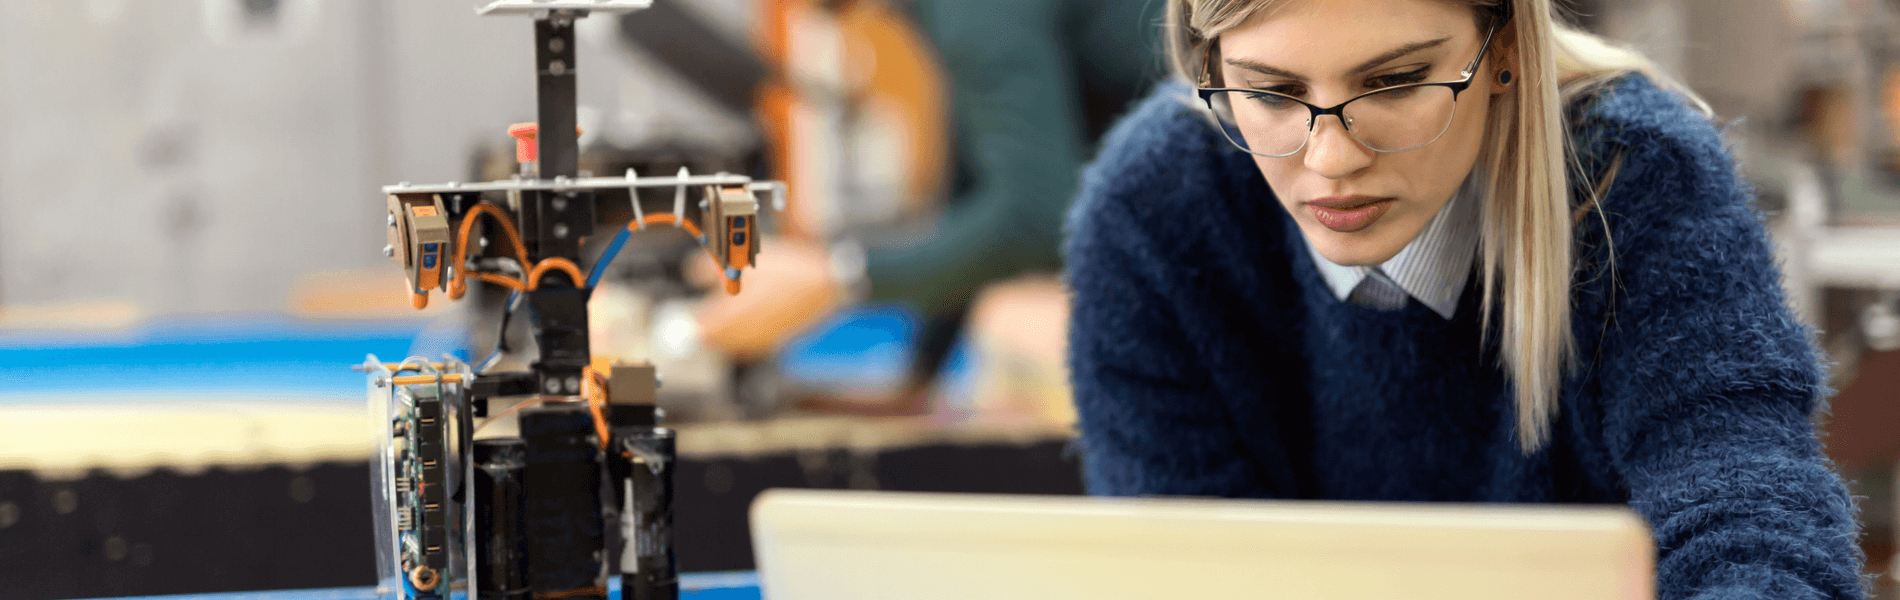 women-in-engineering-banner.png